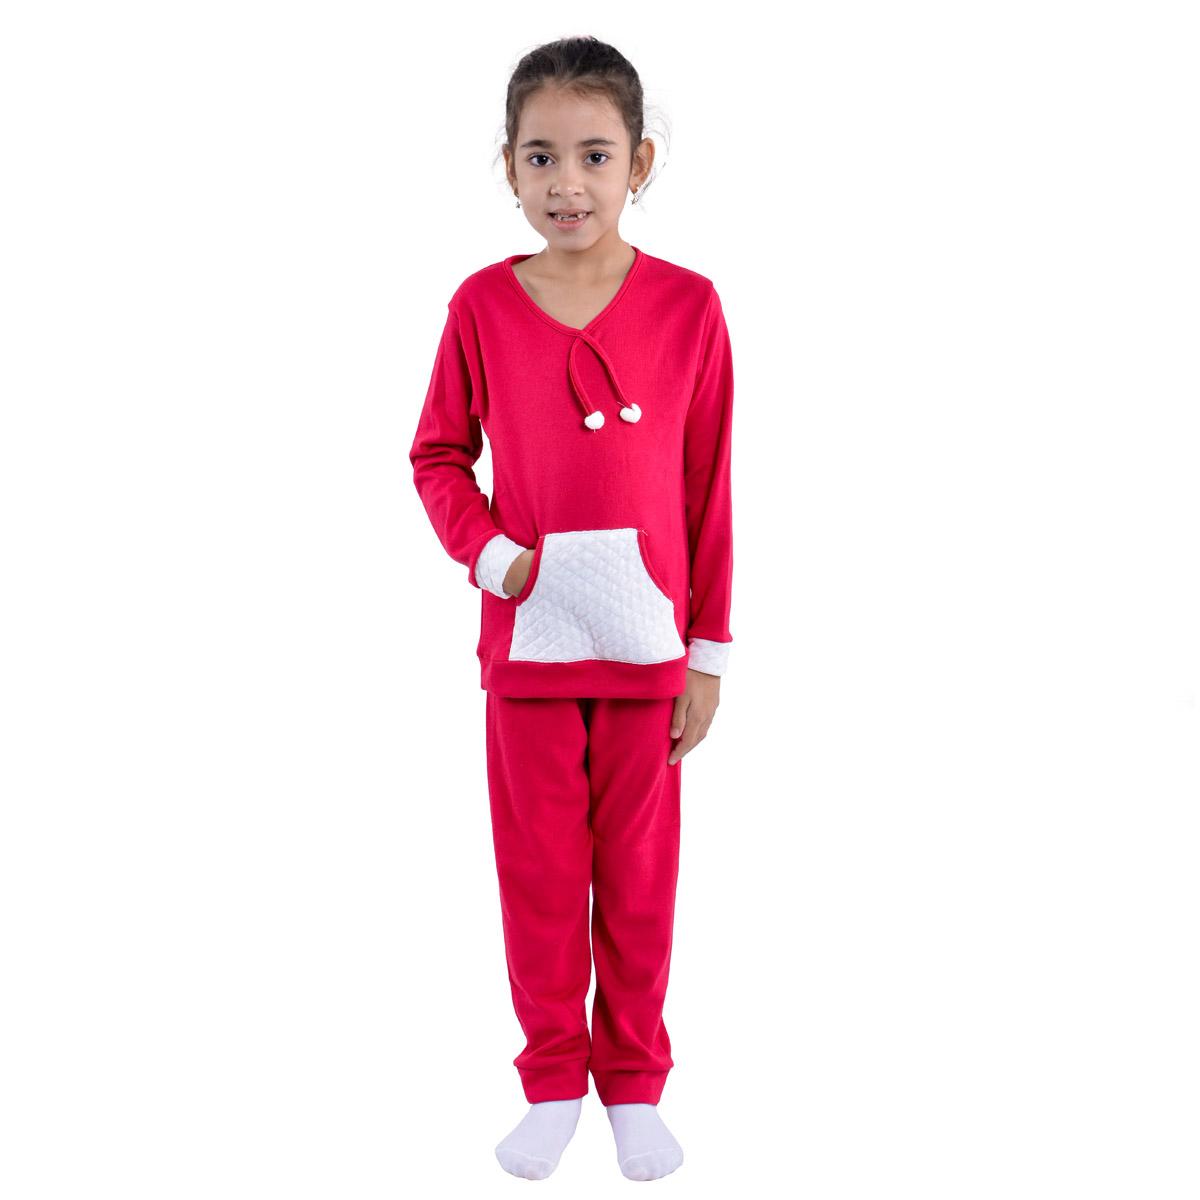 Pijama infantil para menina de inverno KANGURU POM-POM Victory